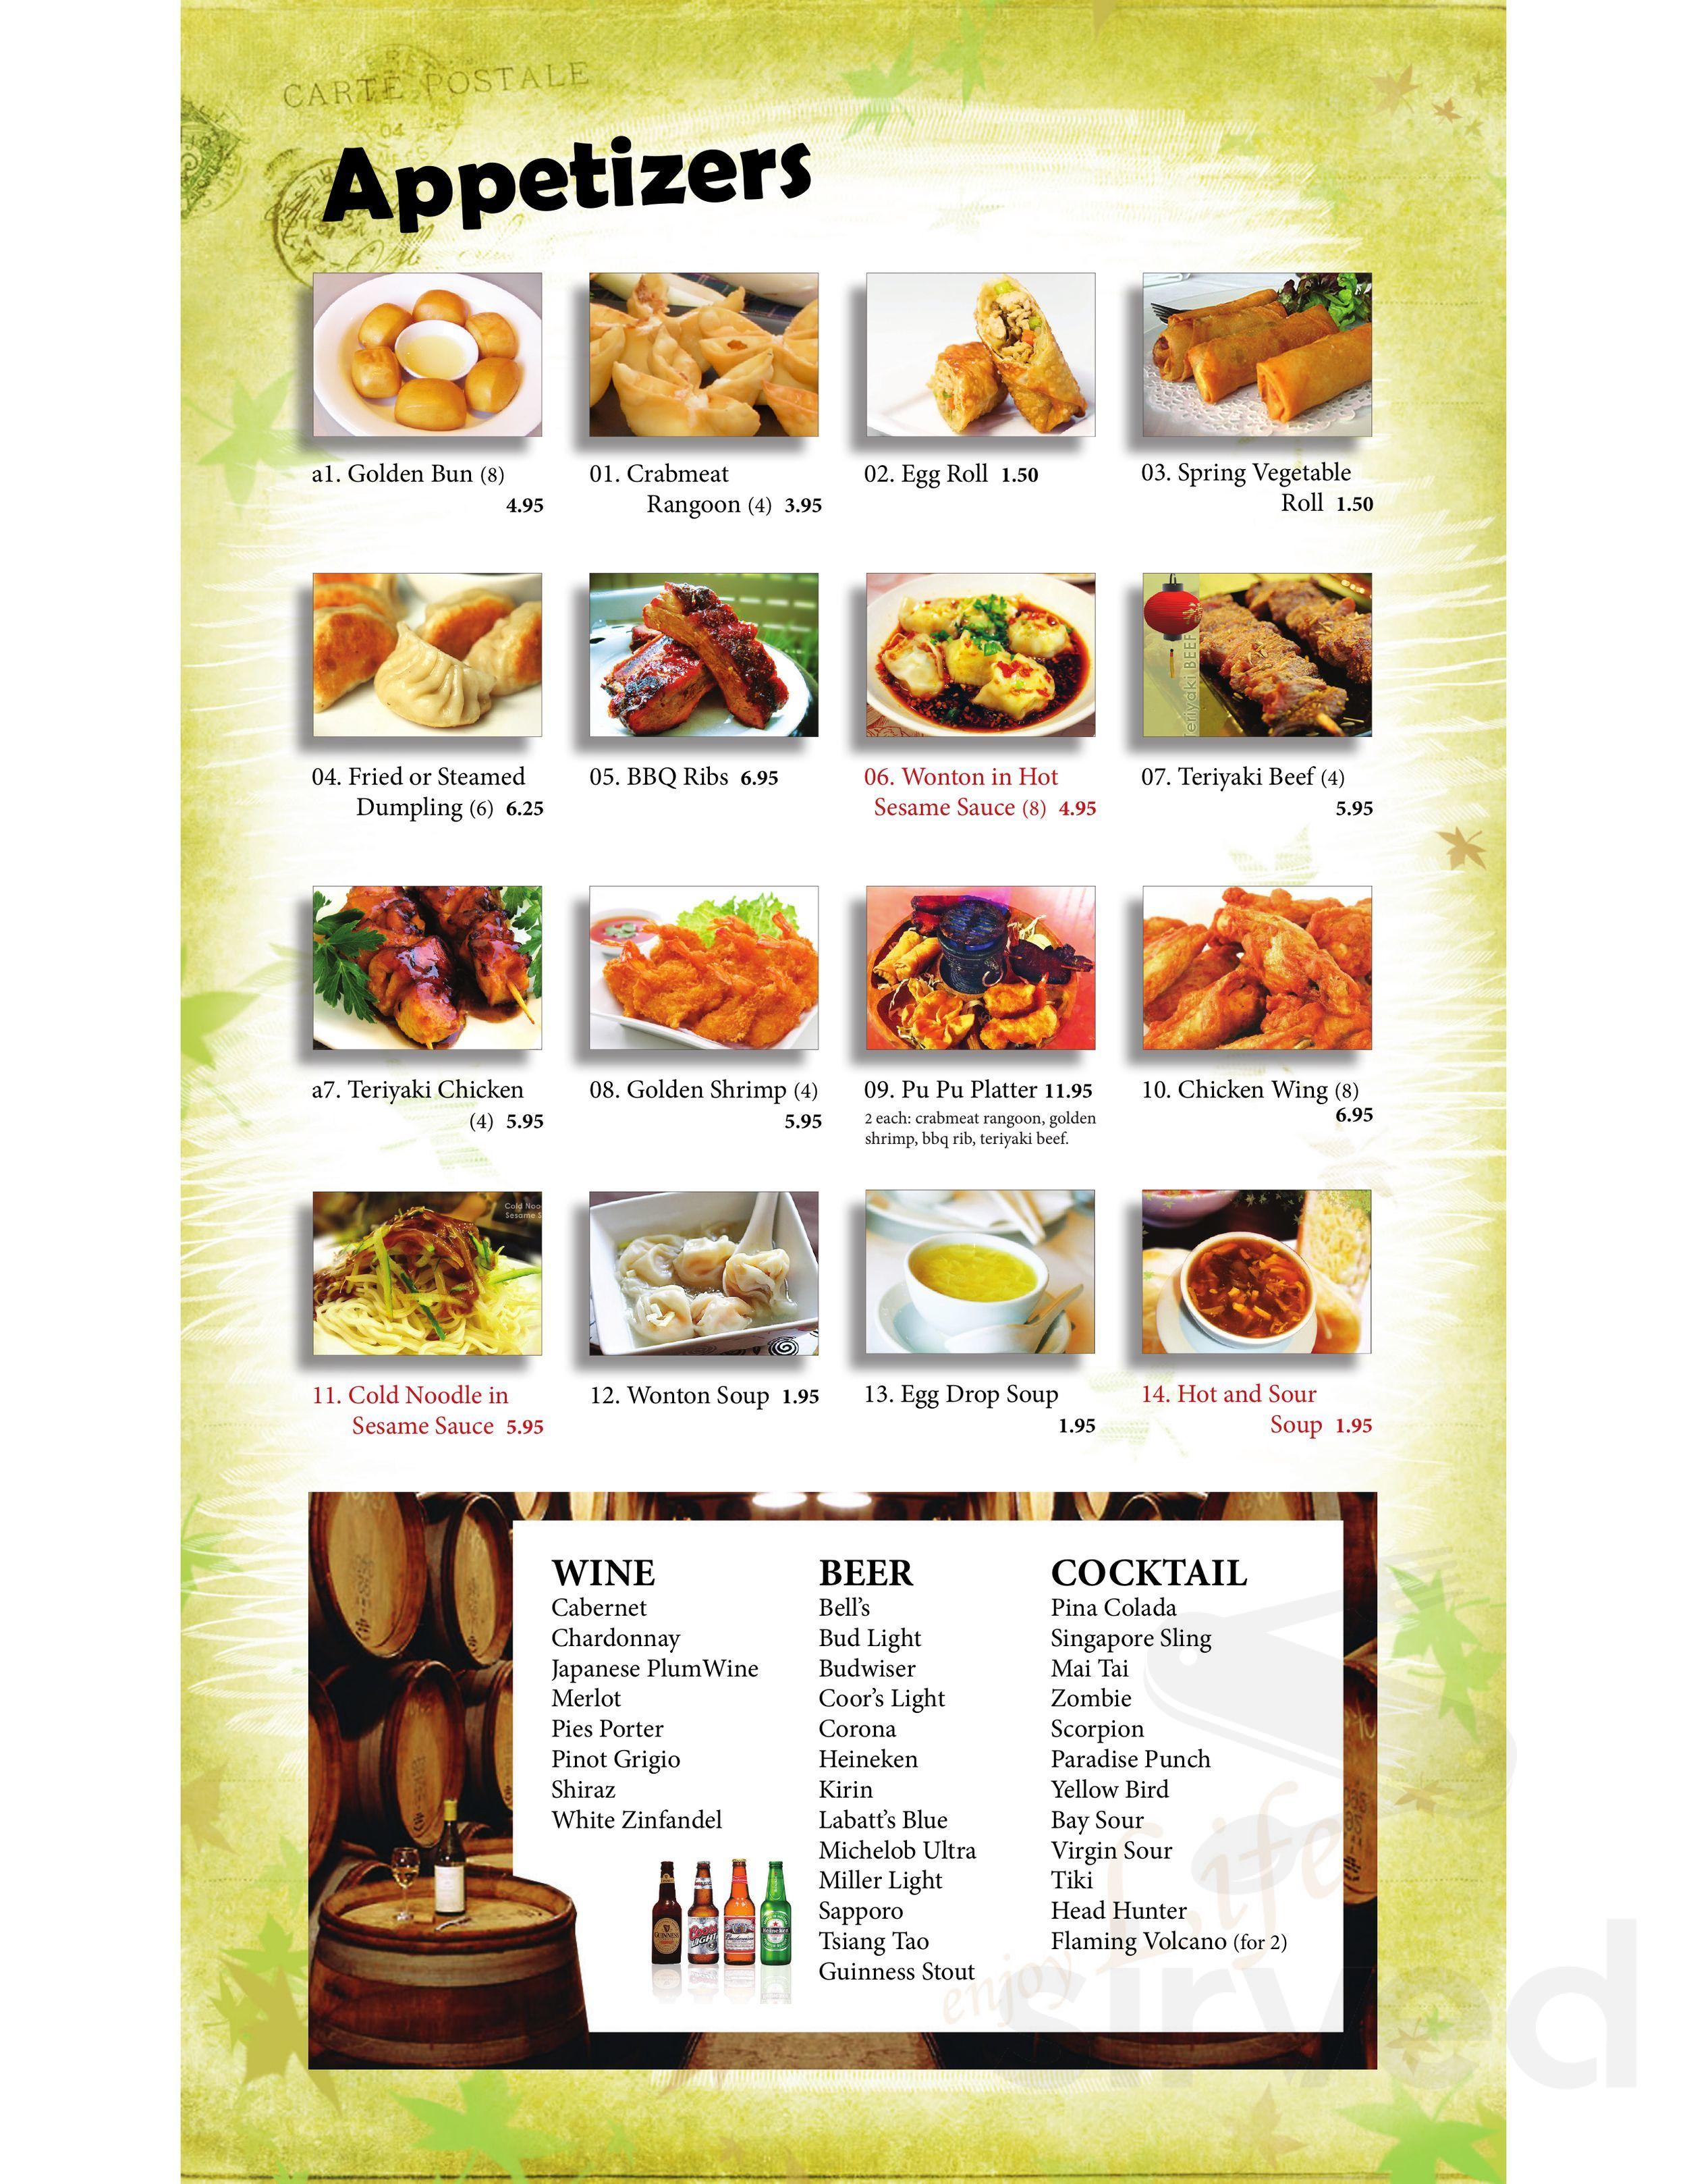 Panda Dynasty menu in Portage, Michigan, USA